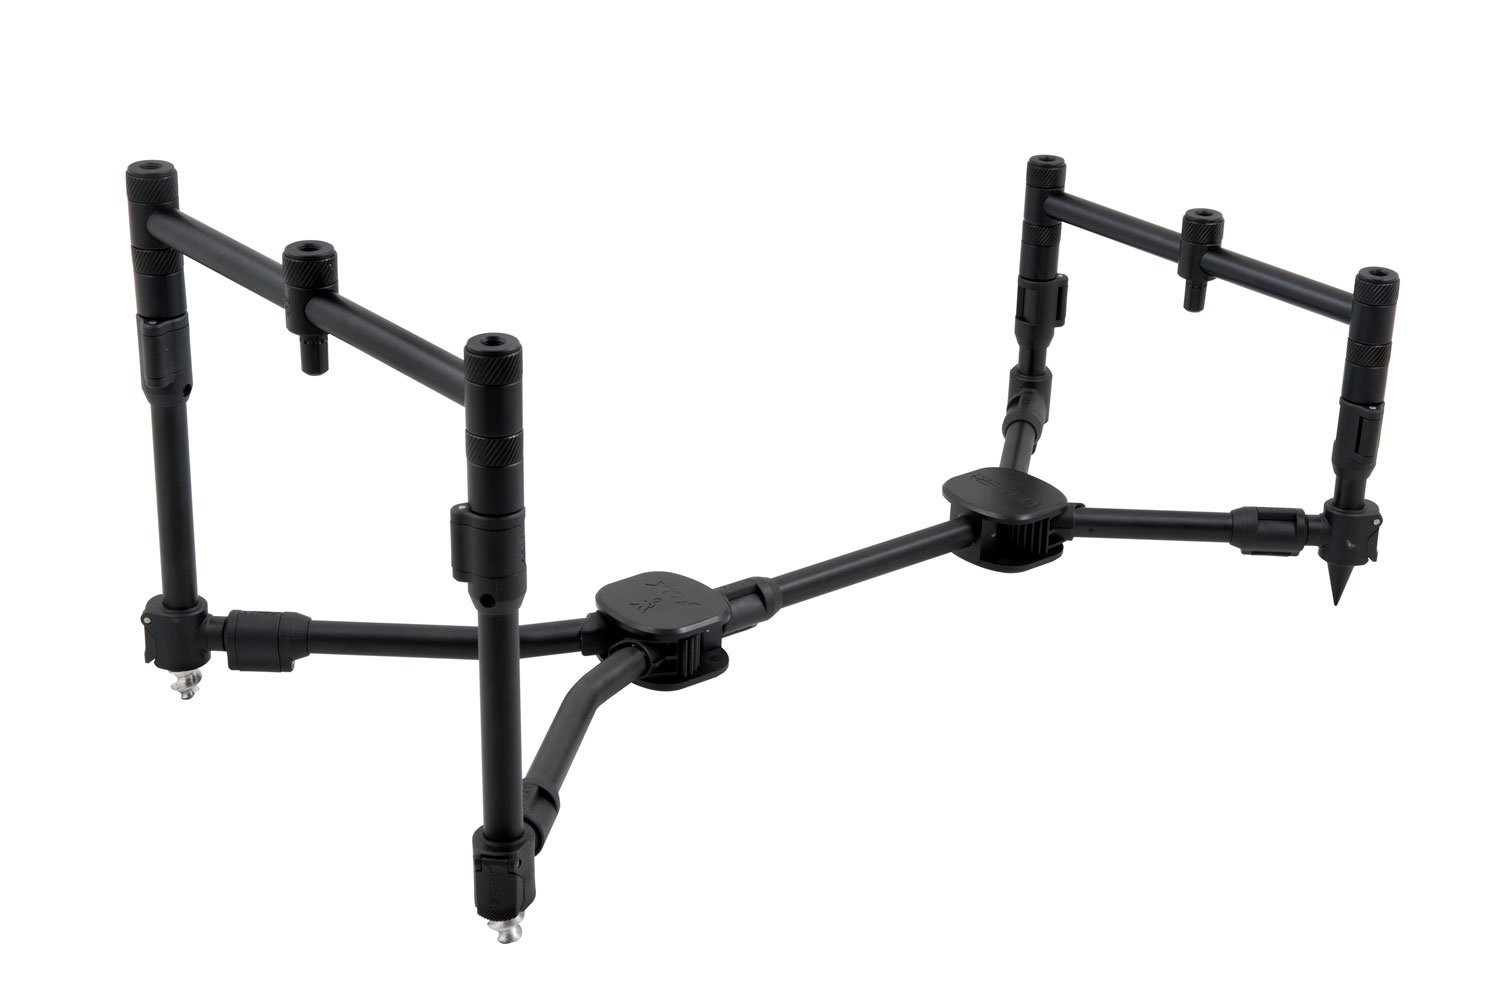 Fox stojan na pruty Black Label QR 3 rod Pod complete